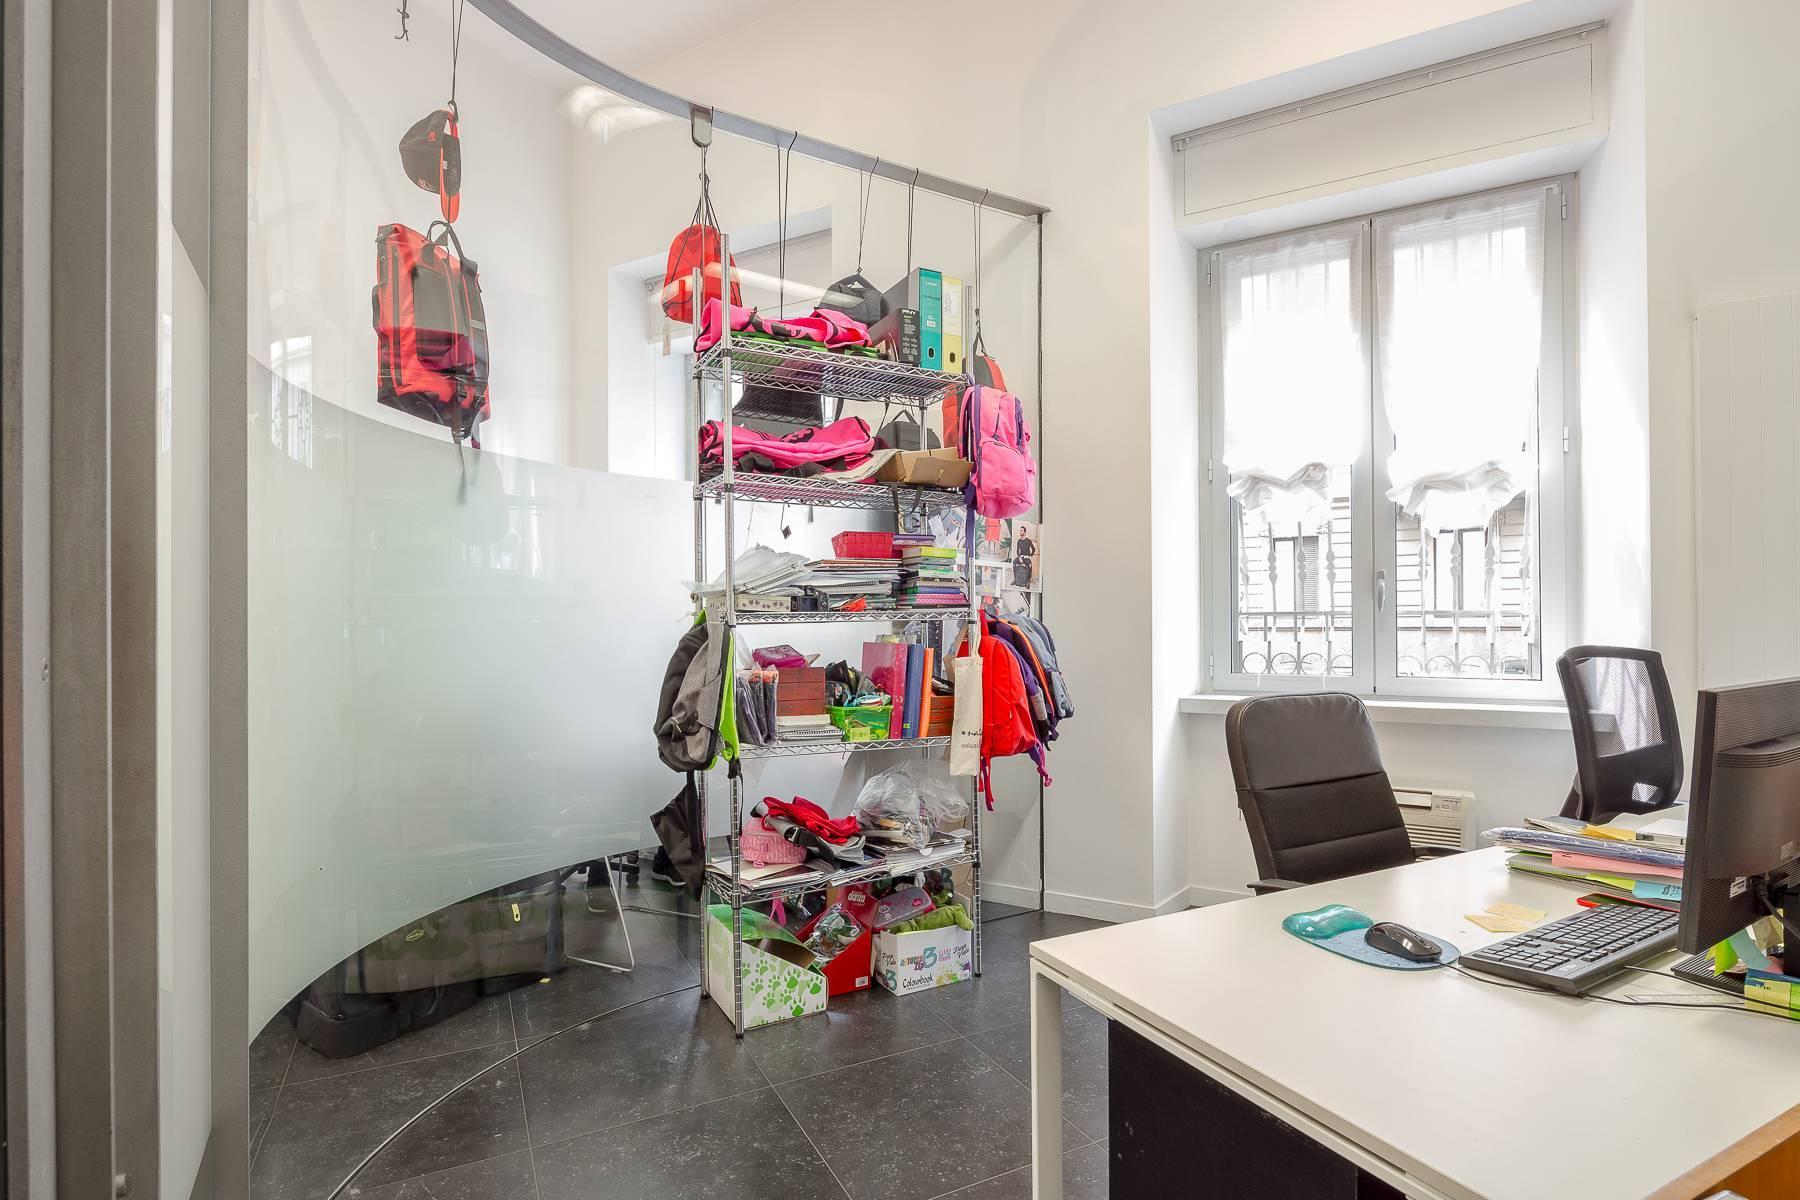 Open space office/residential property in Piazza Giovine Italia/Via Aurelio Saffi - 12